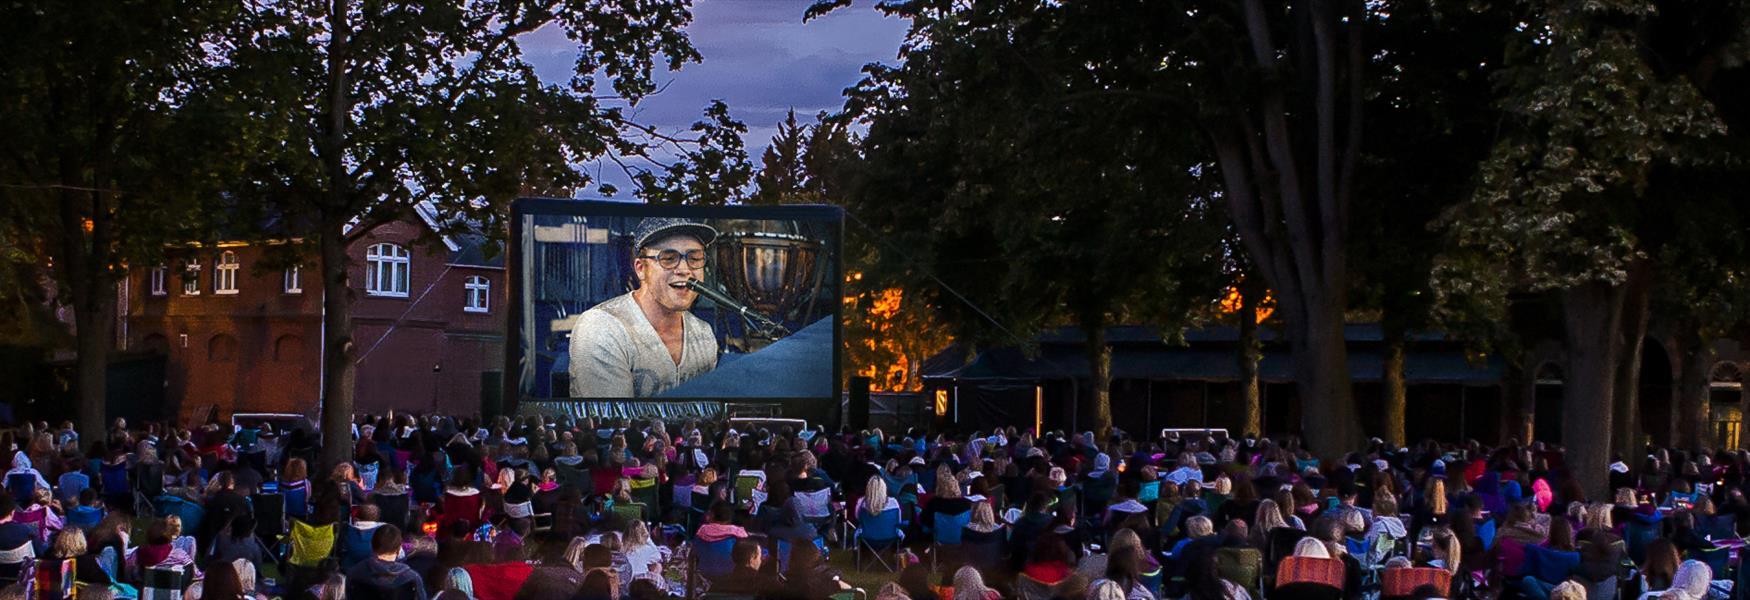 Luna Open Air Cinema at Ascot Racecourse